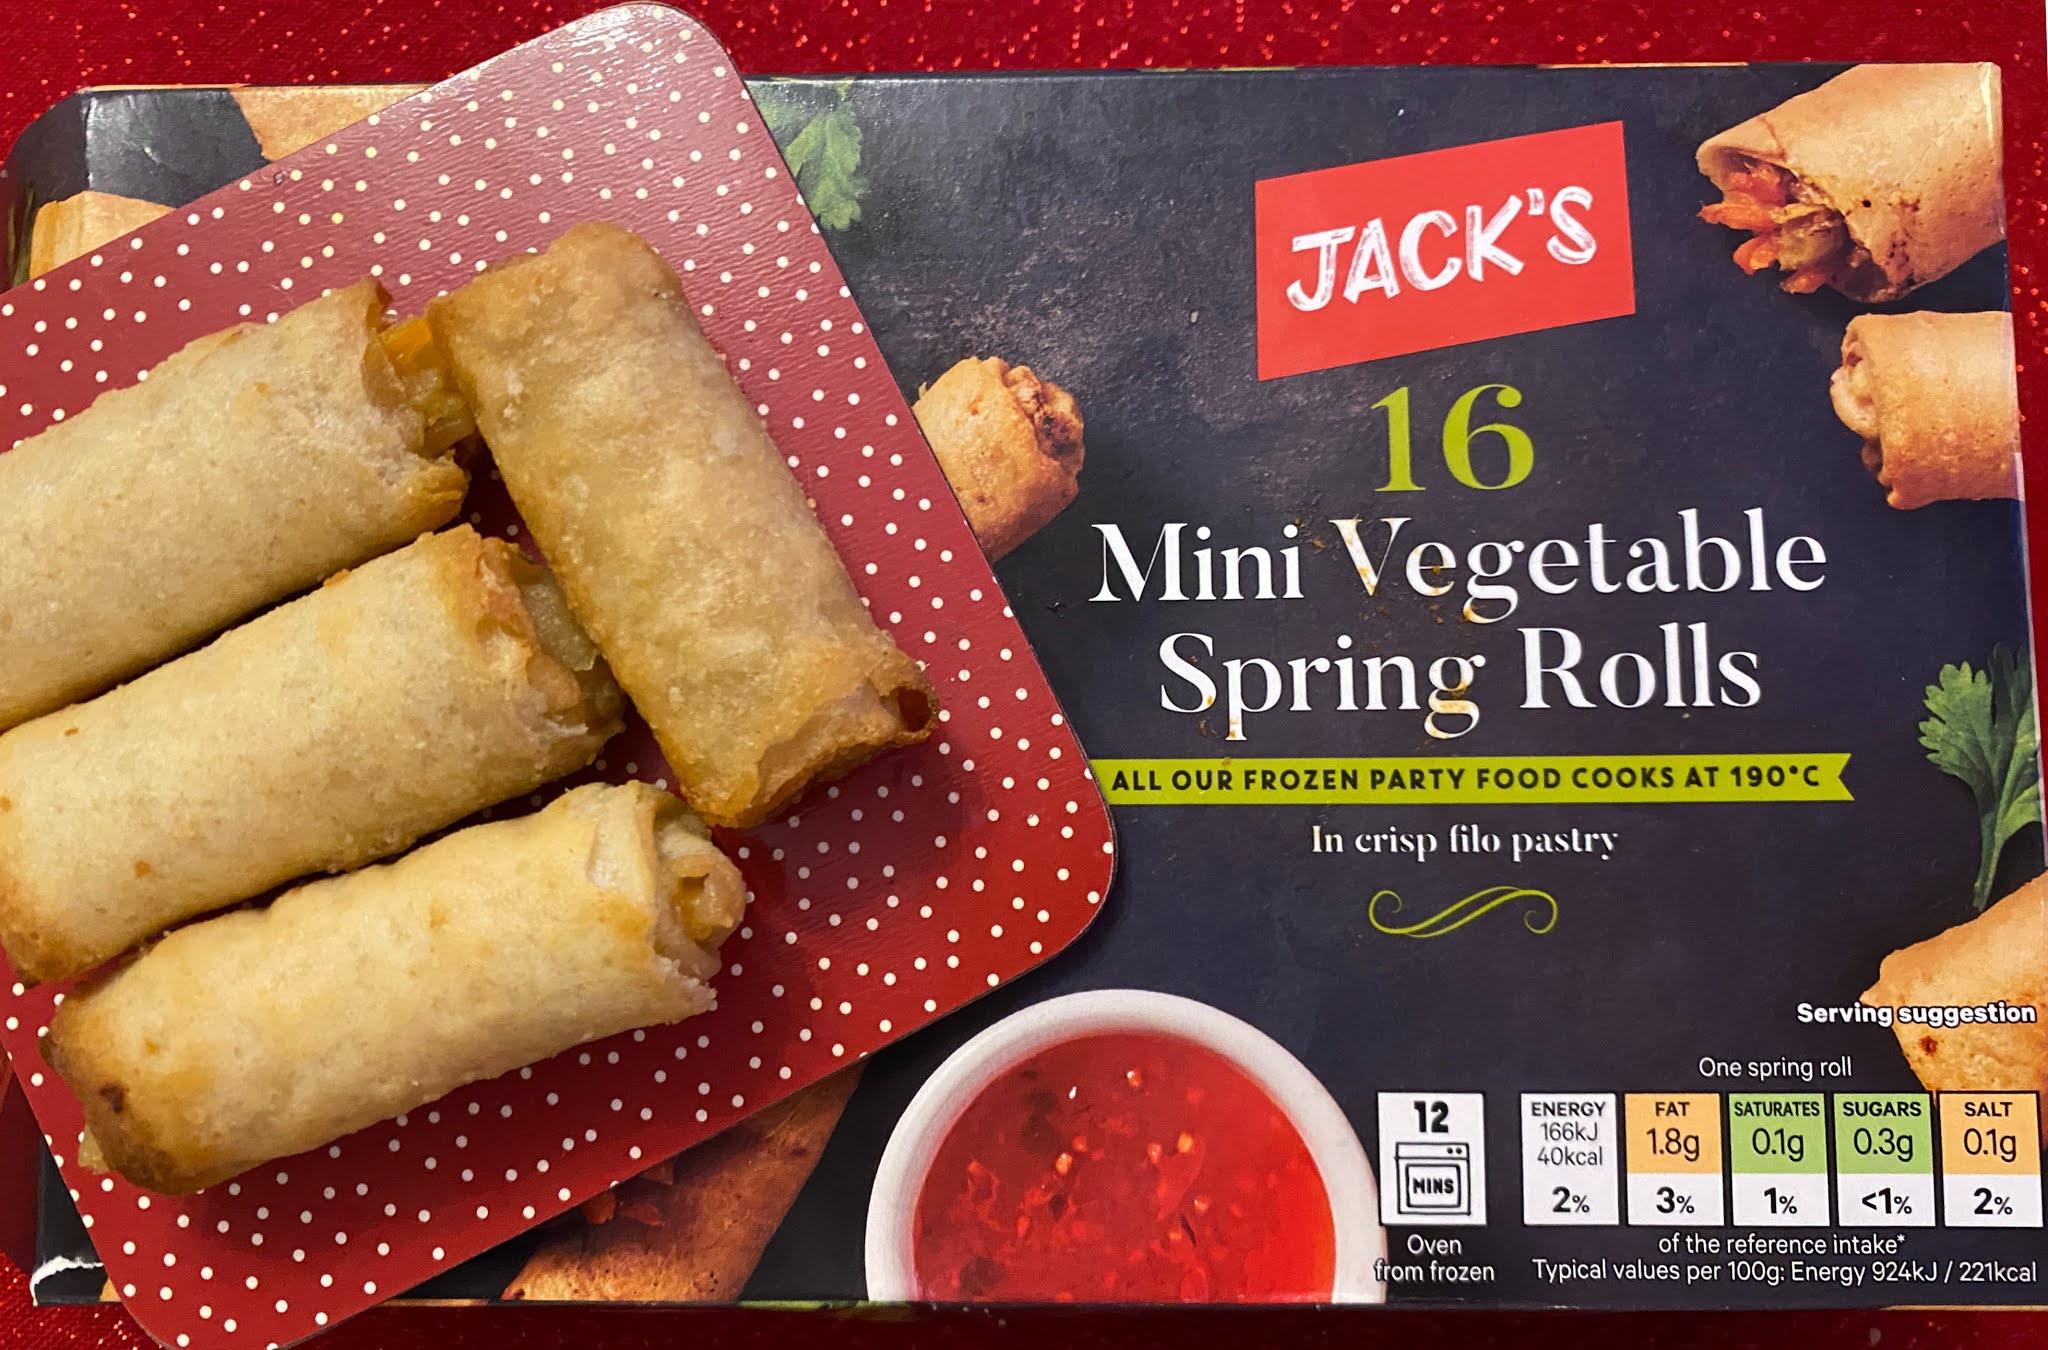 Jack's Mini vegetable spring rolls